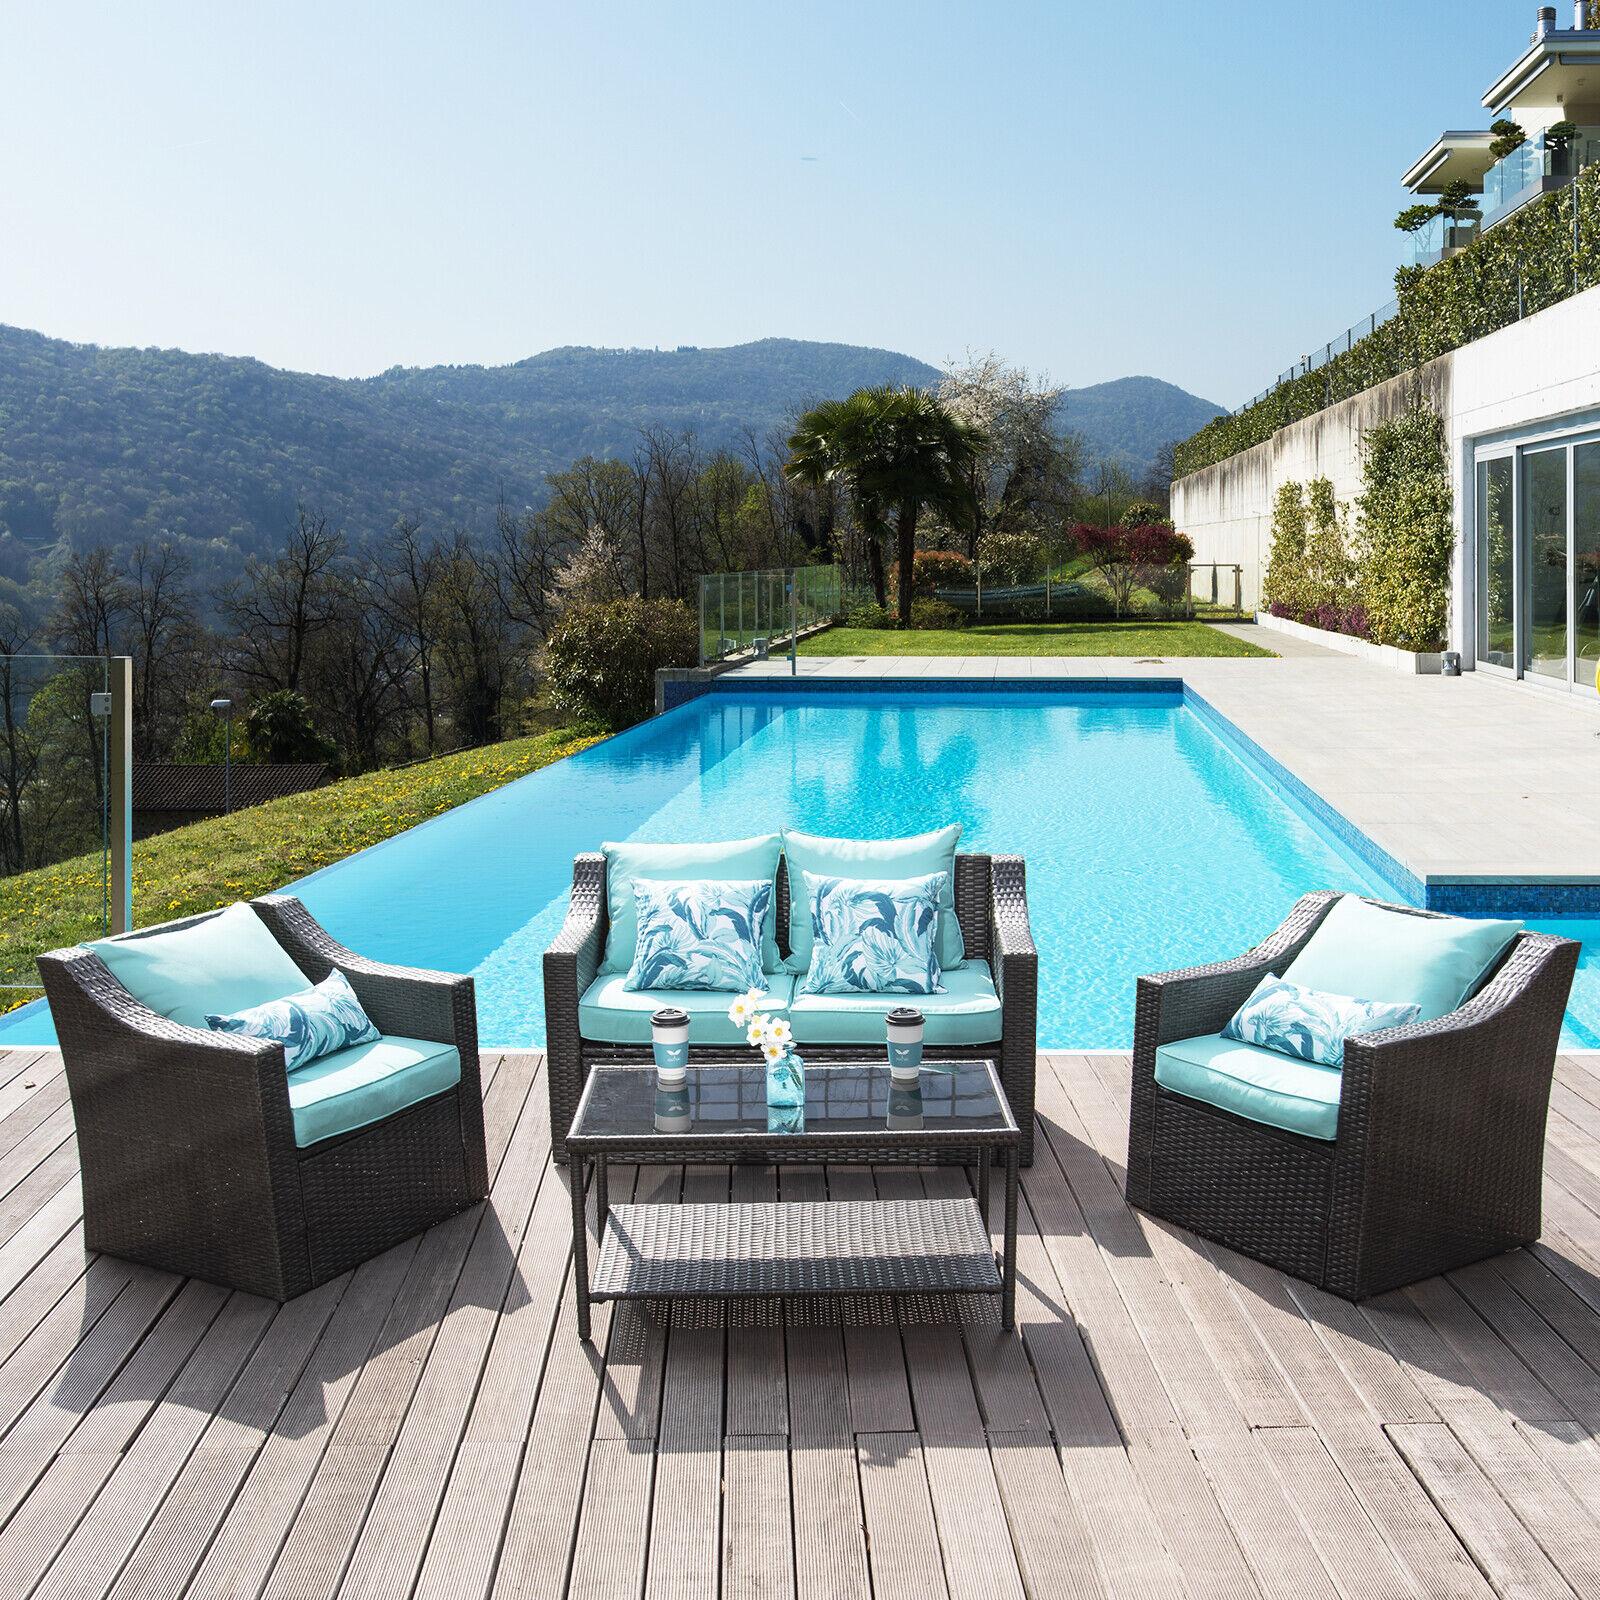 4PCS Patio Furniture Sofa Set Outdoor Garden Cushion Rattan